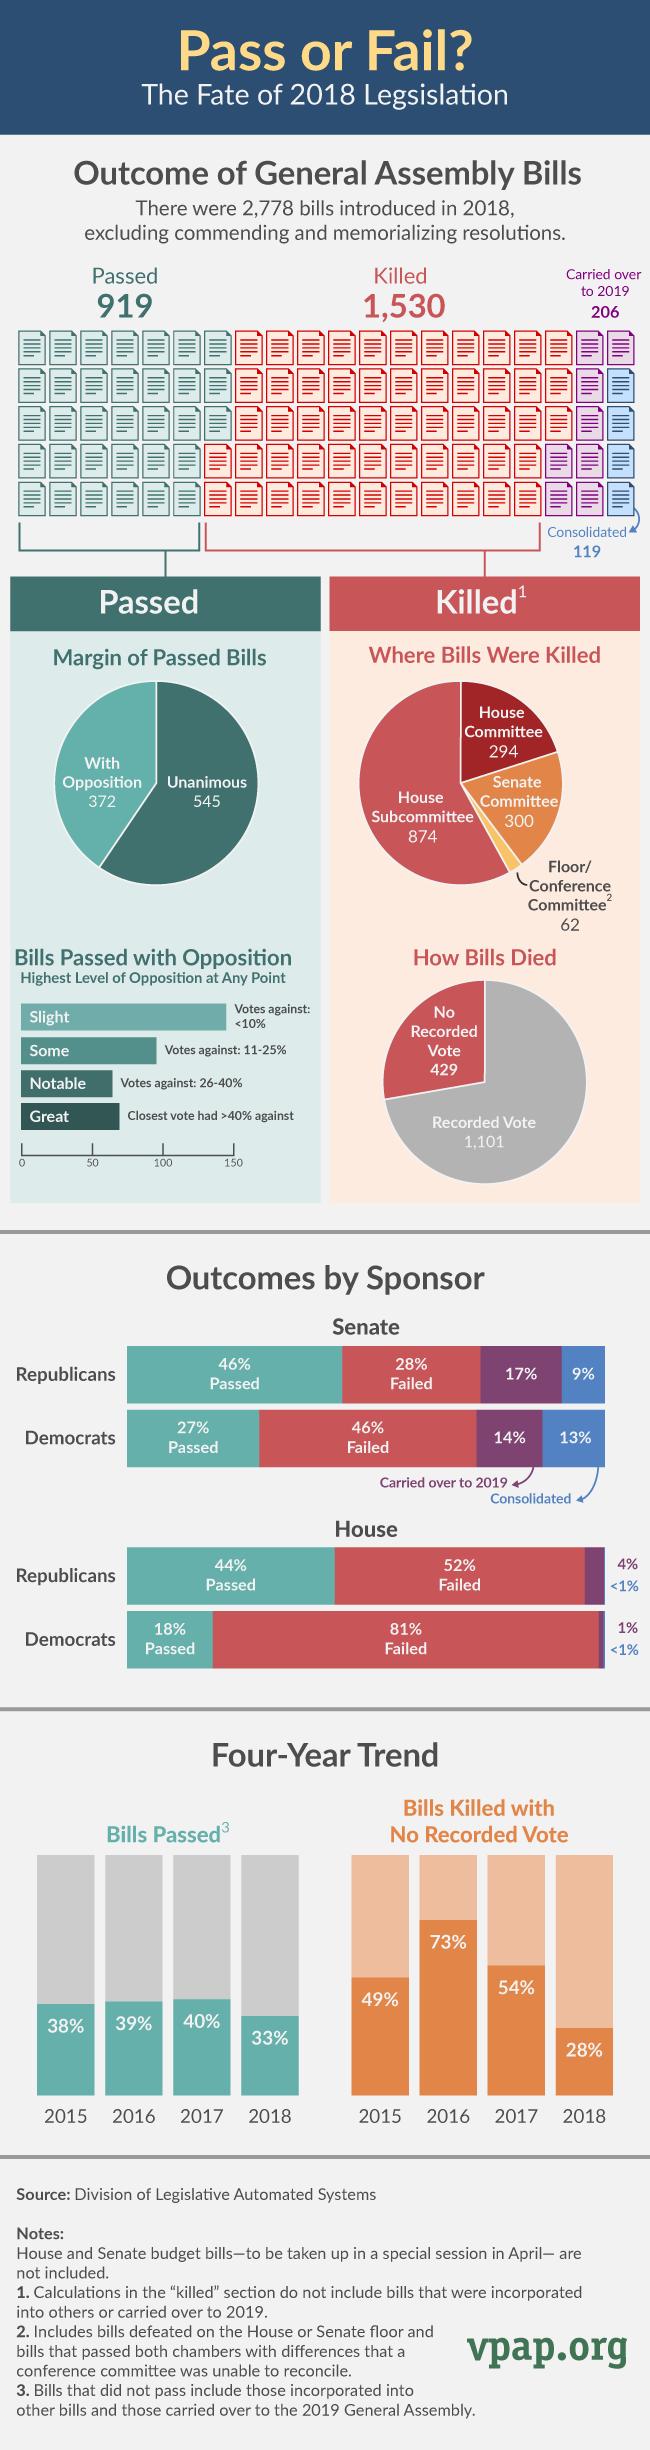 Fate of 2018 Legislation